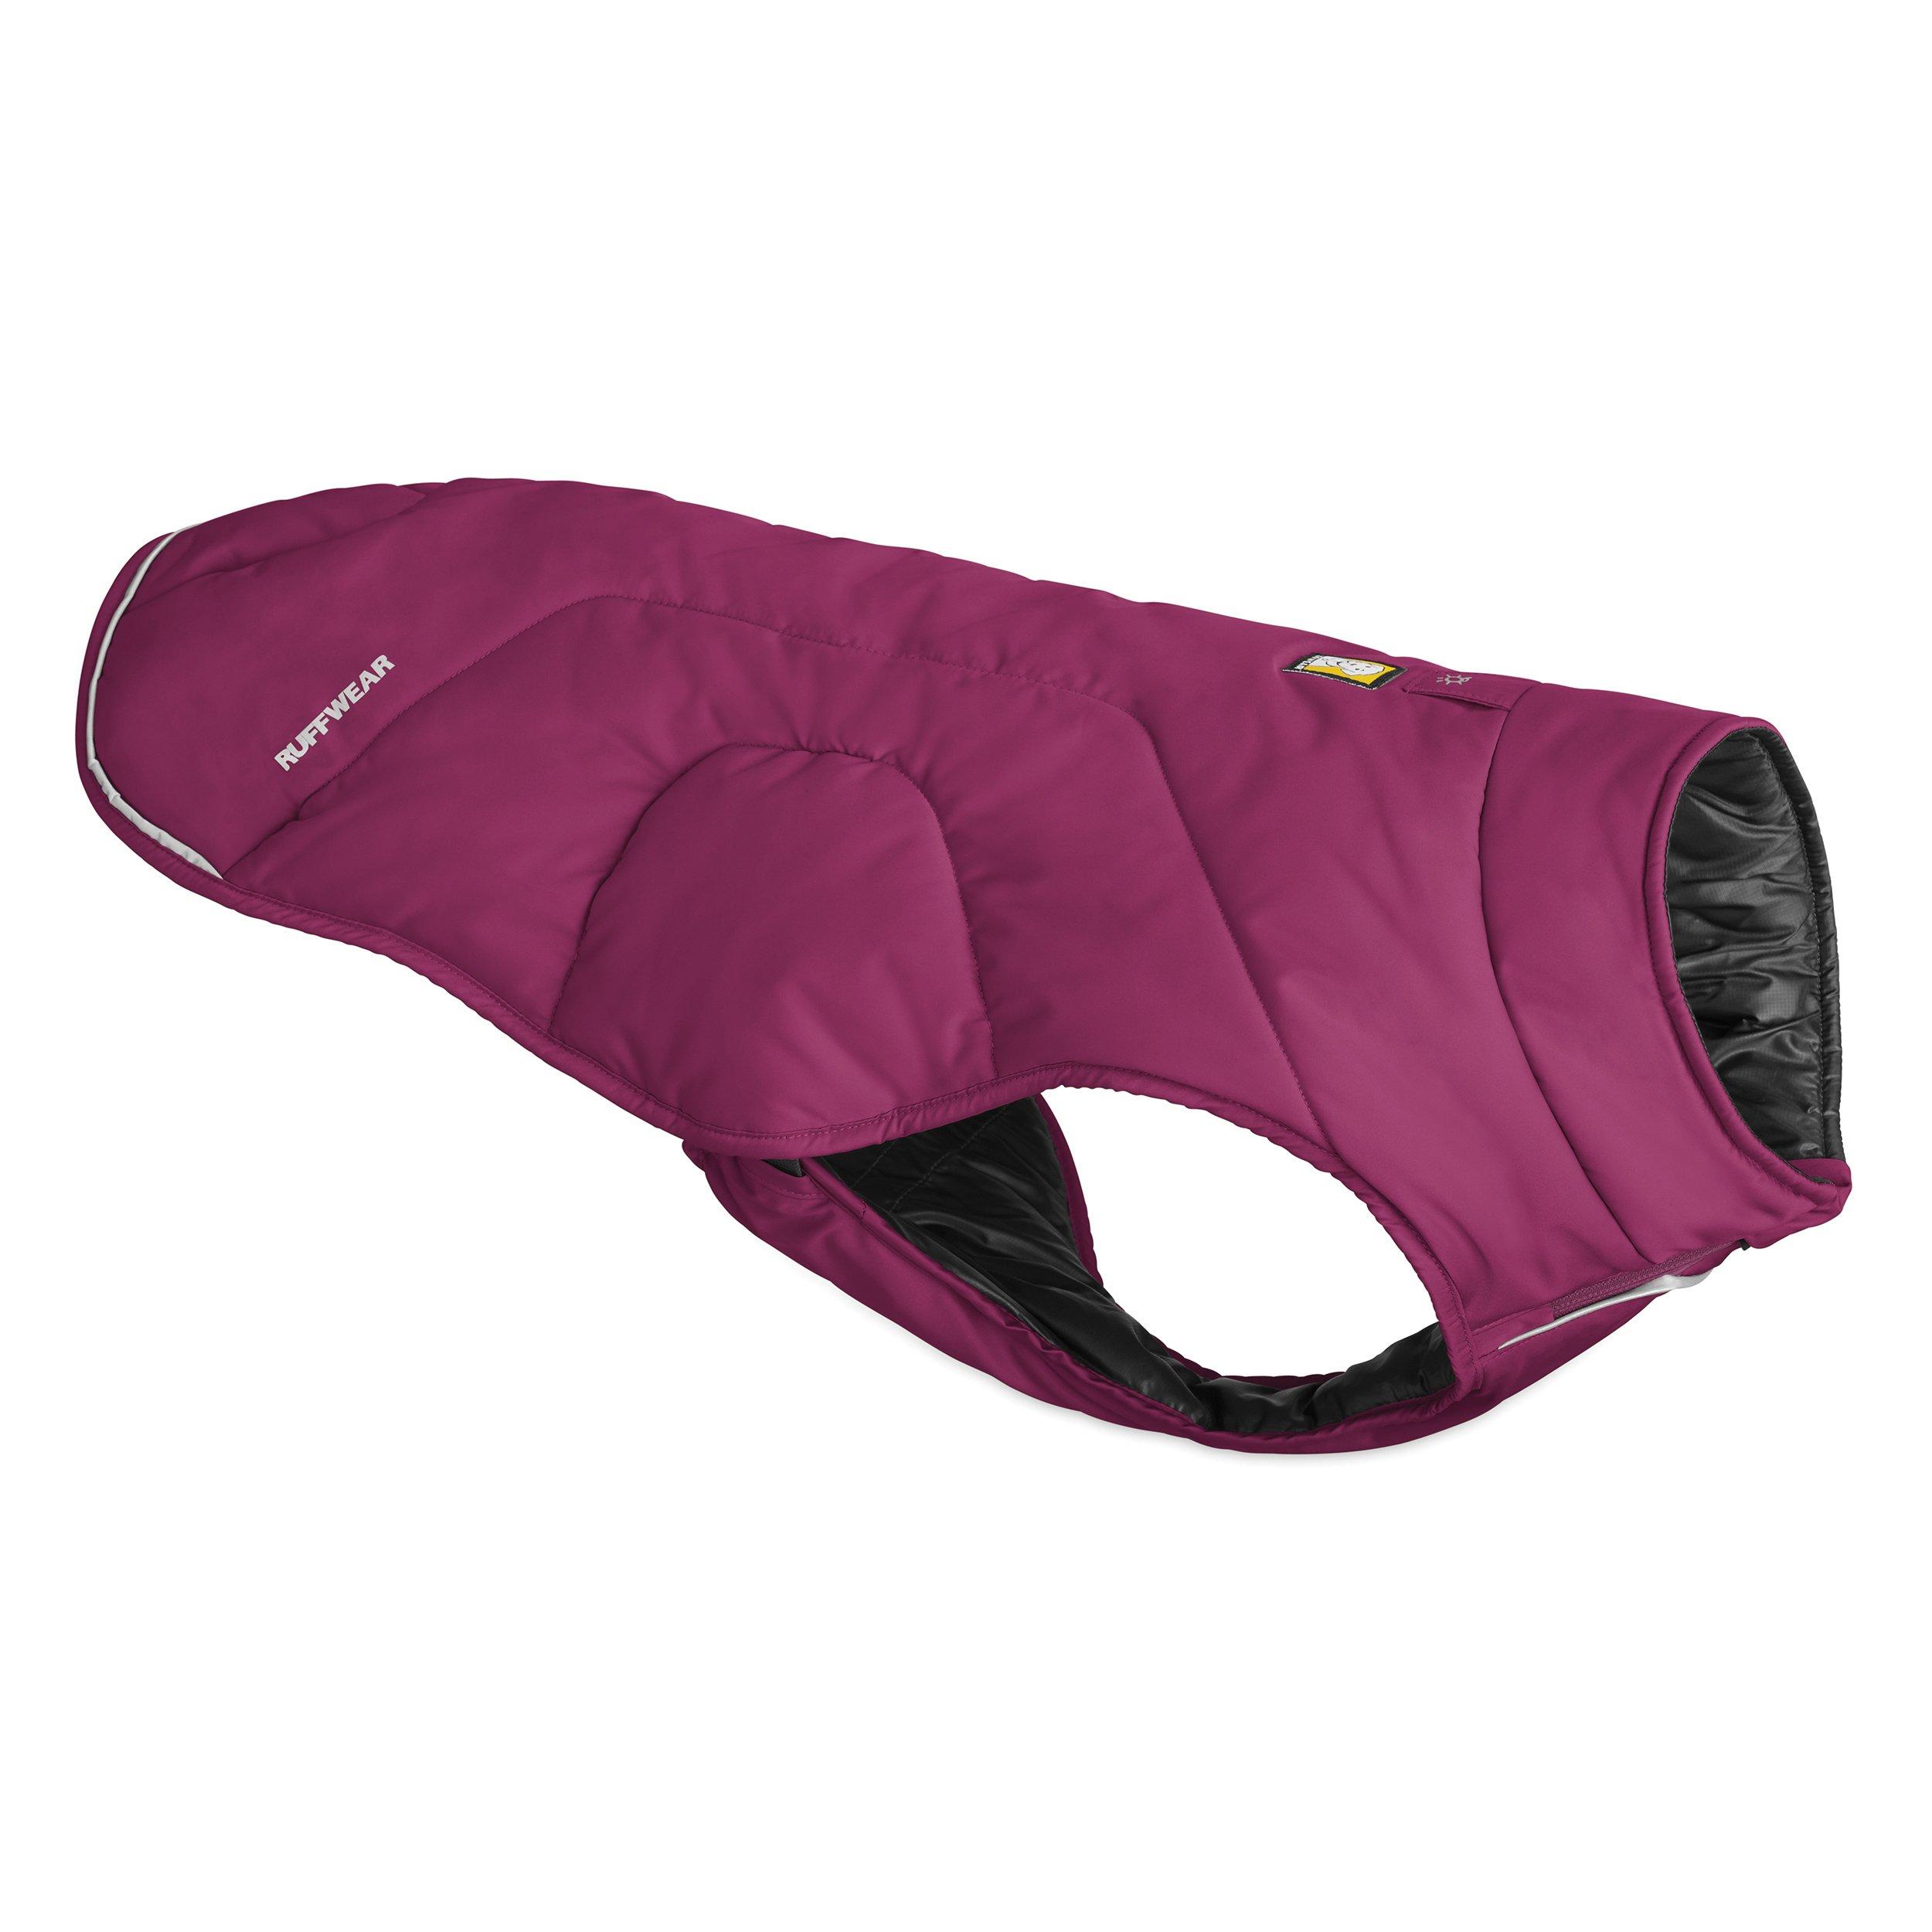 Ruffwear - Quinzee Warm, Lightweight Insulated Jacket for Dogs, Larkspur Purple, Small